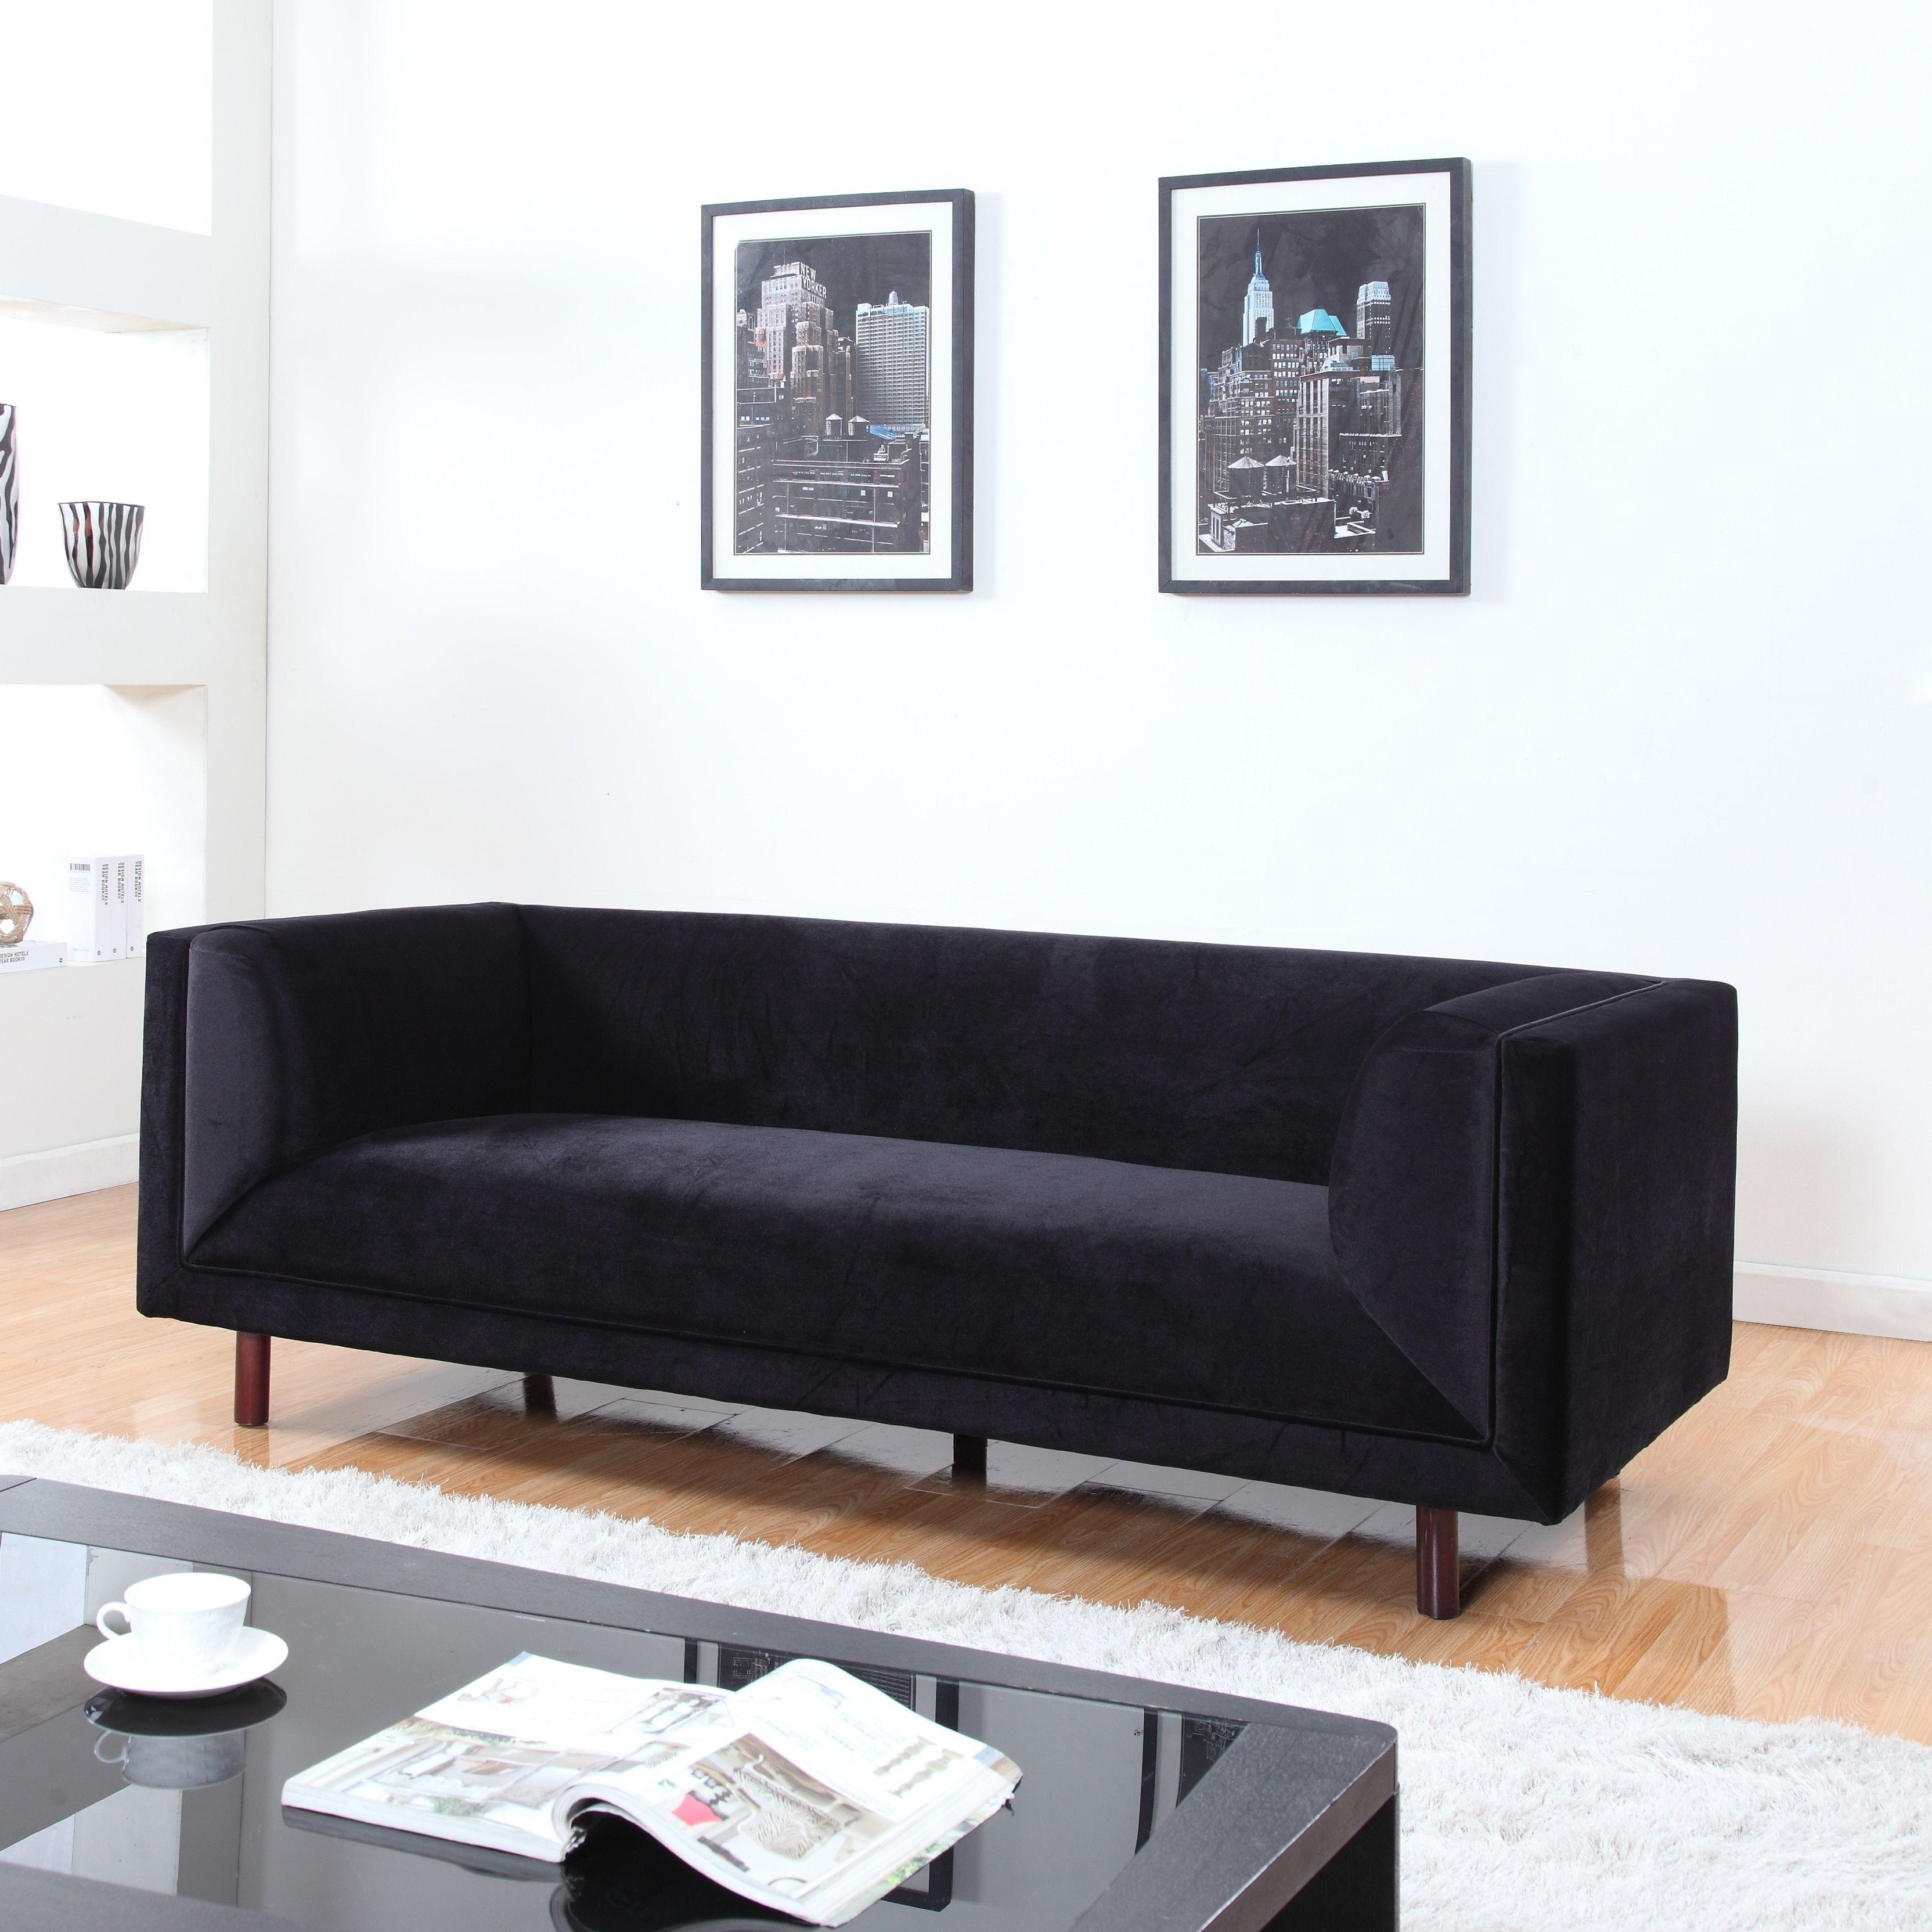 Madison mid century modern velvet sofa in colors red black and grey black